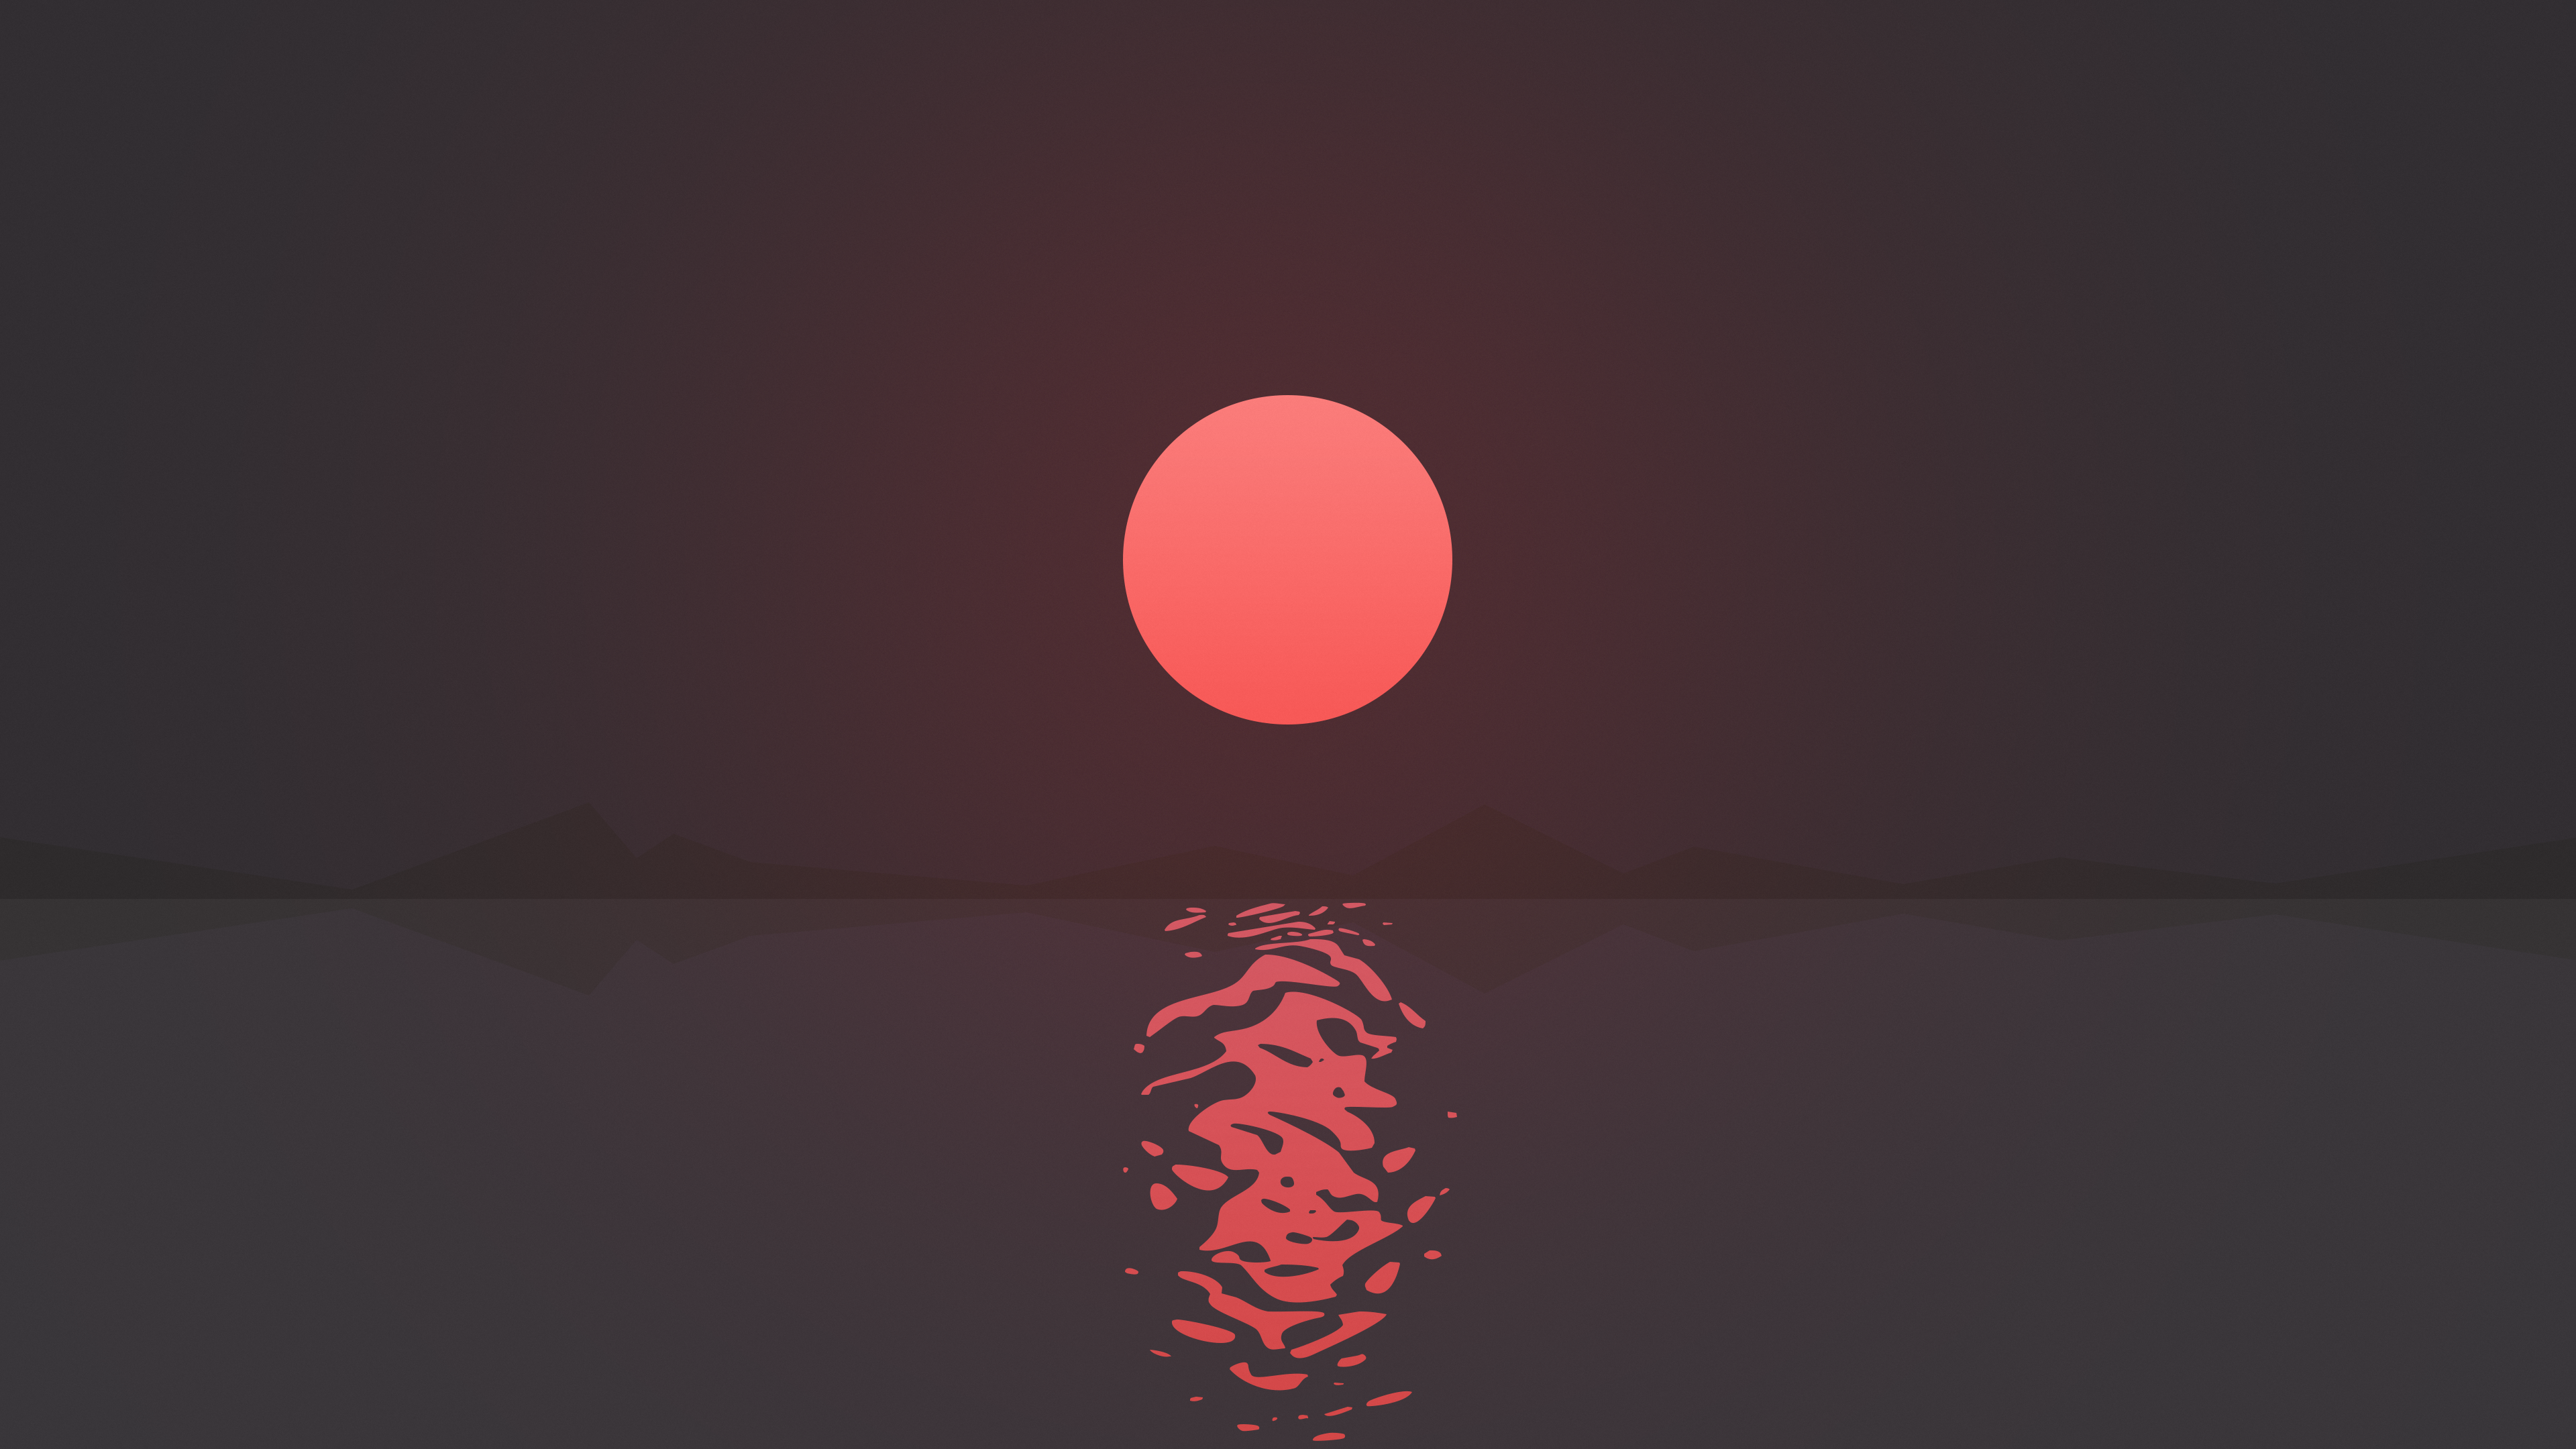 General 3840x2160 Sun minimalism mountains reflection sea